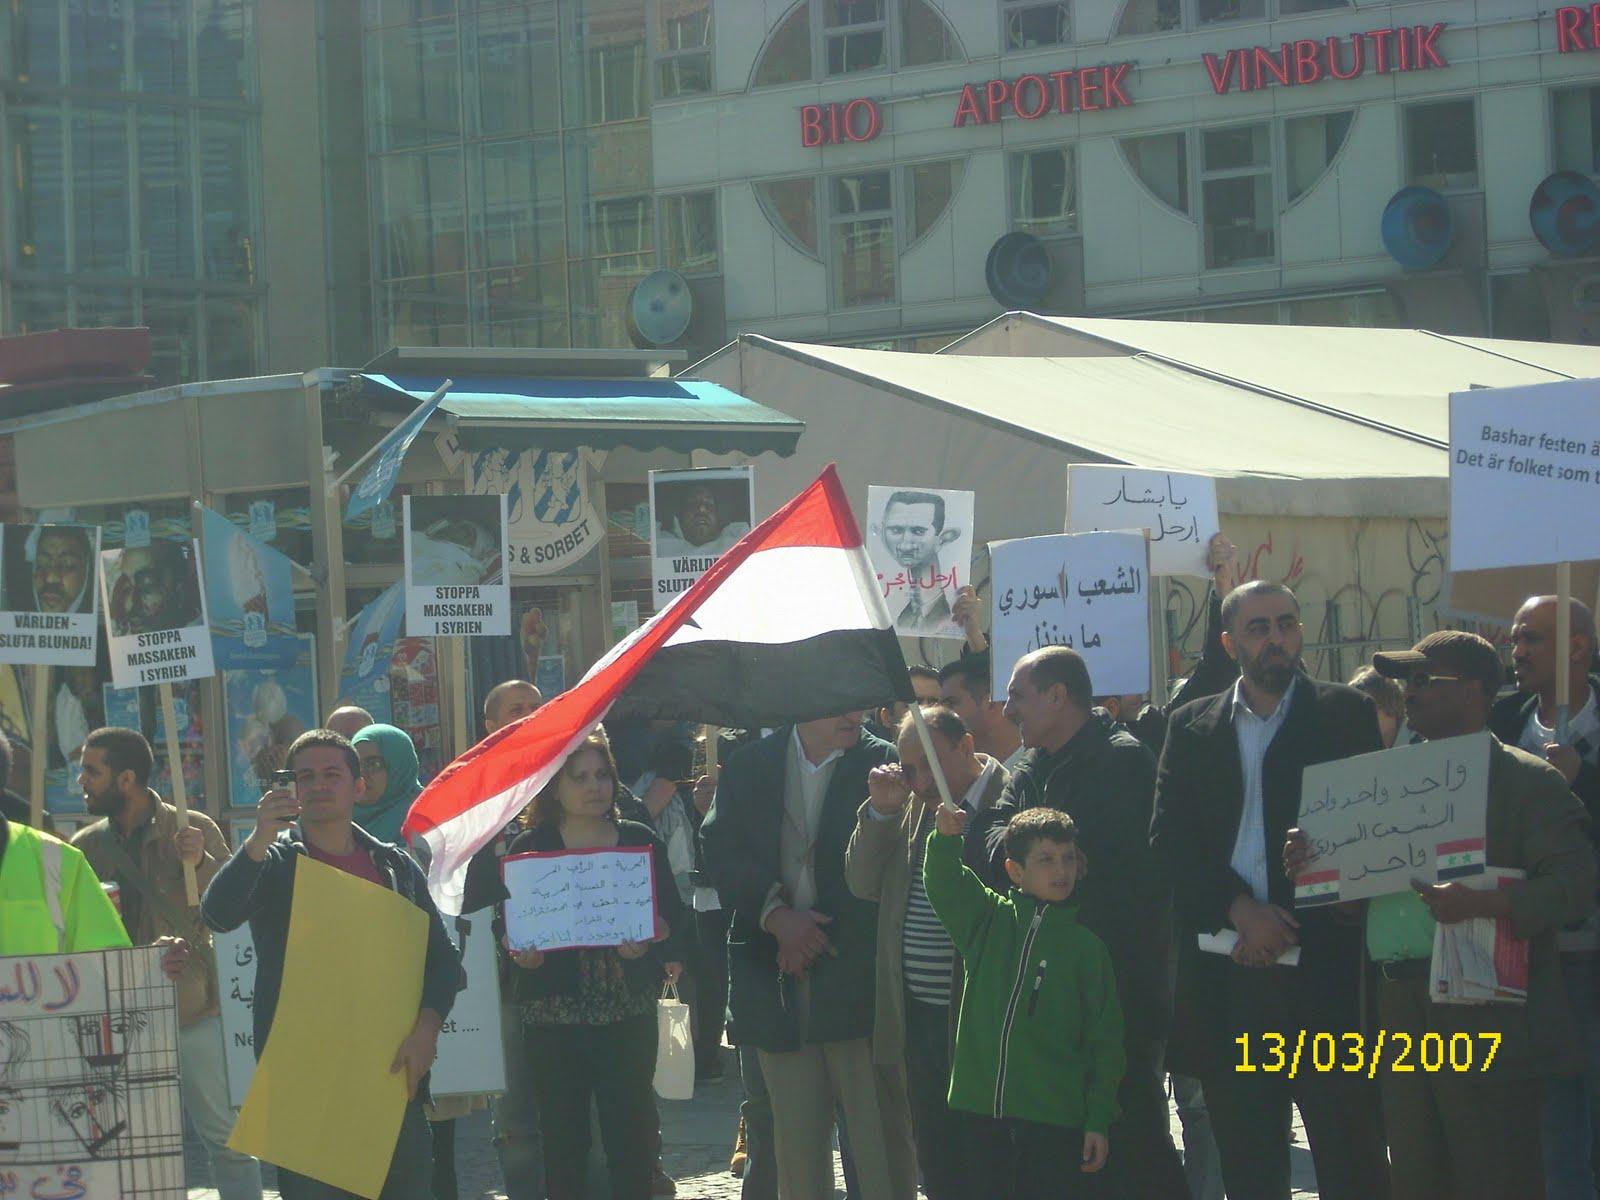 Syrien fangslar regimkritiker